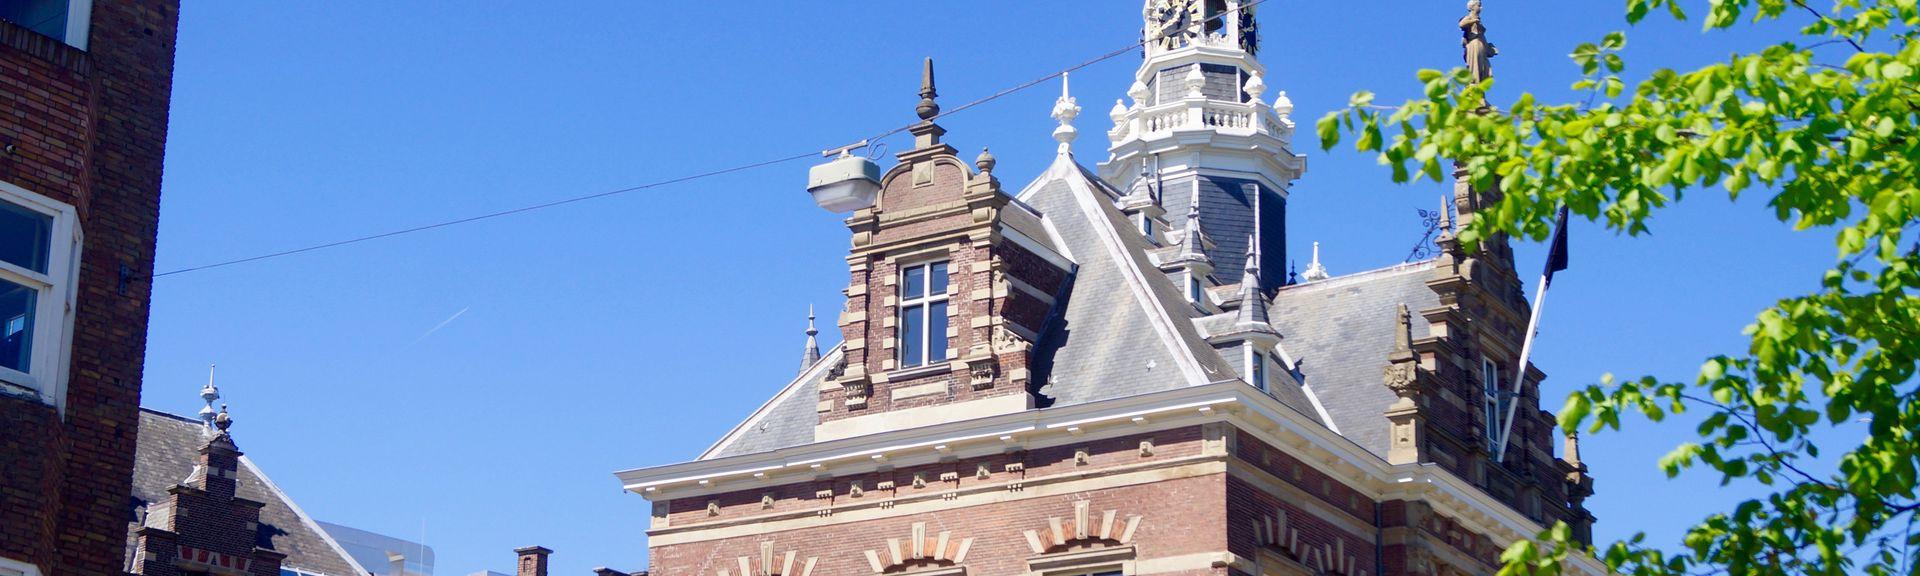 Amsterdam South, Amsterdam, North Holland, Netherlands